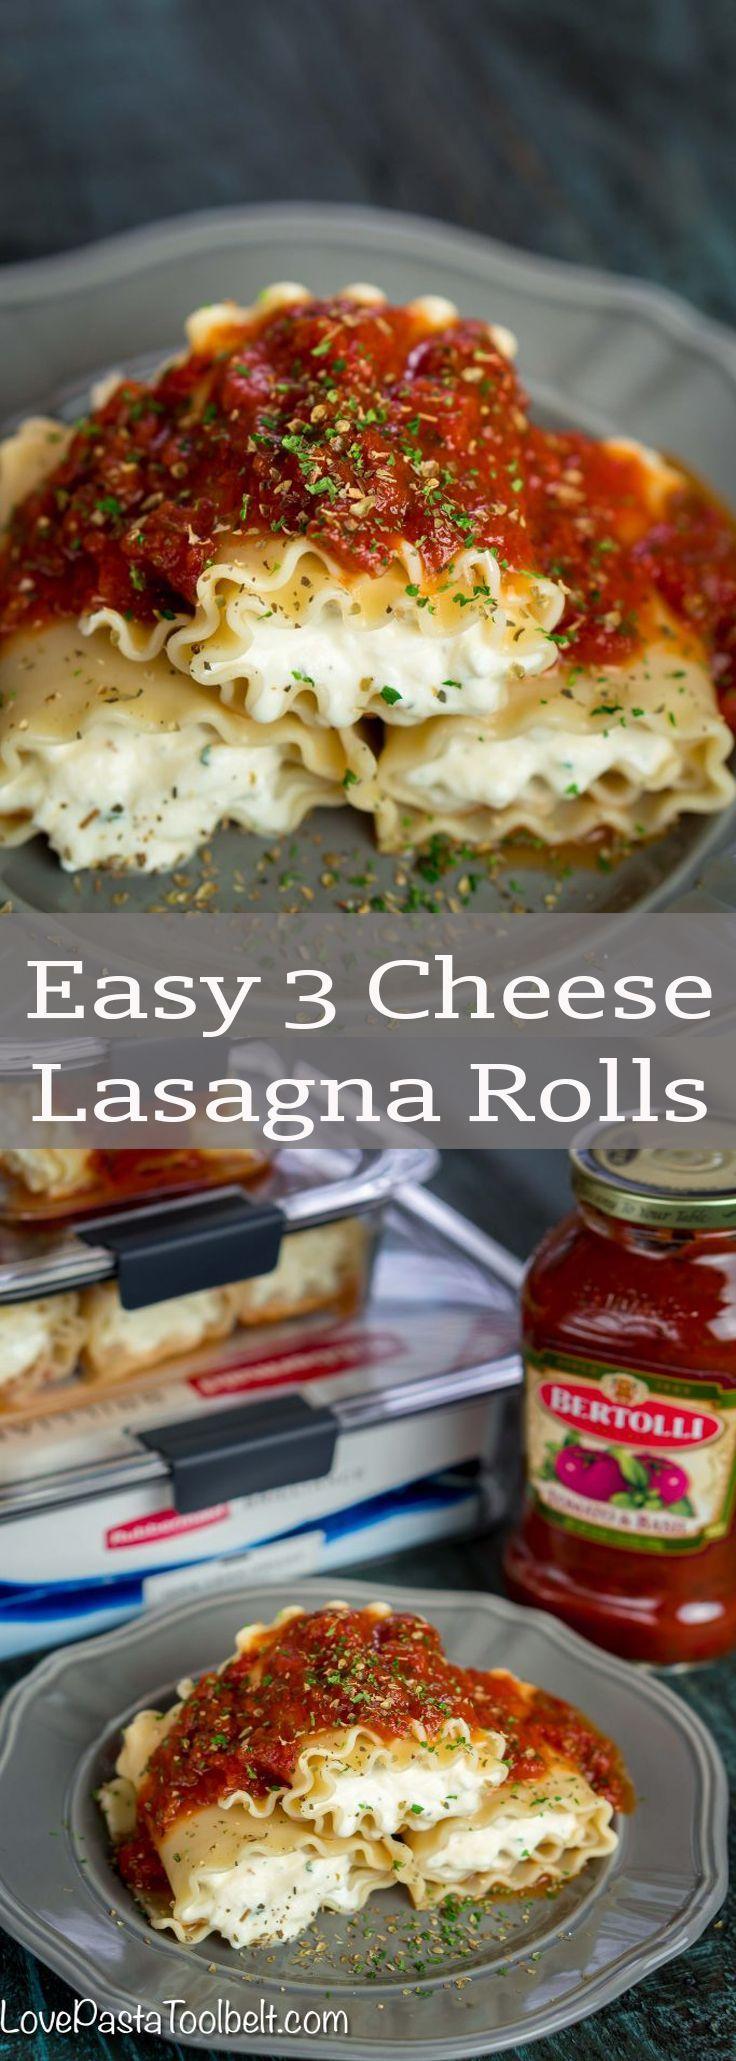 Easy 3 Cheese Lasagna Rolls- meal prep, easy dinner ideas, recipes, pasta, lasagna, dinner, red sauce, food, lasagna roll ups, cheese  #PremiumPrep #ad